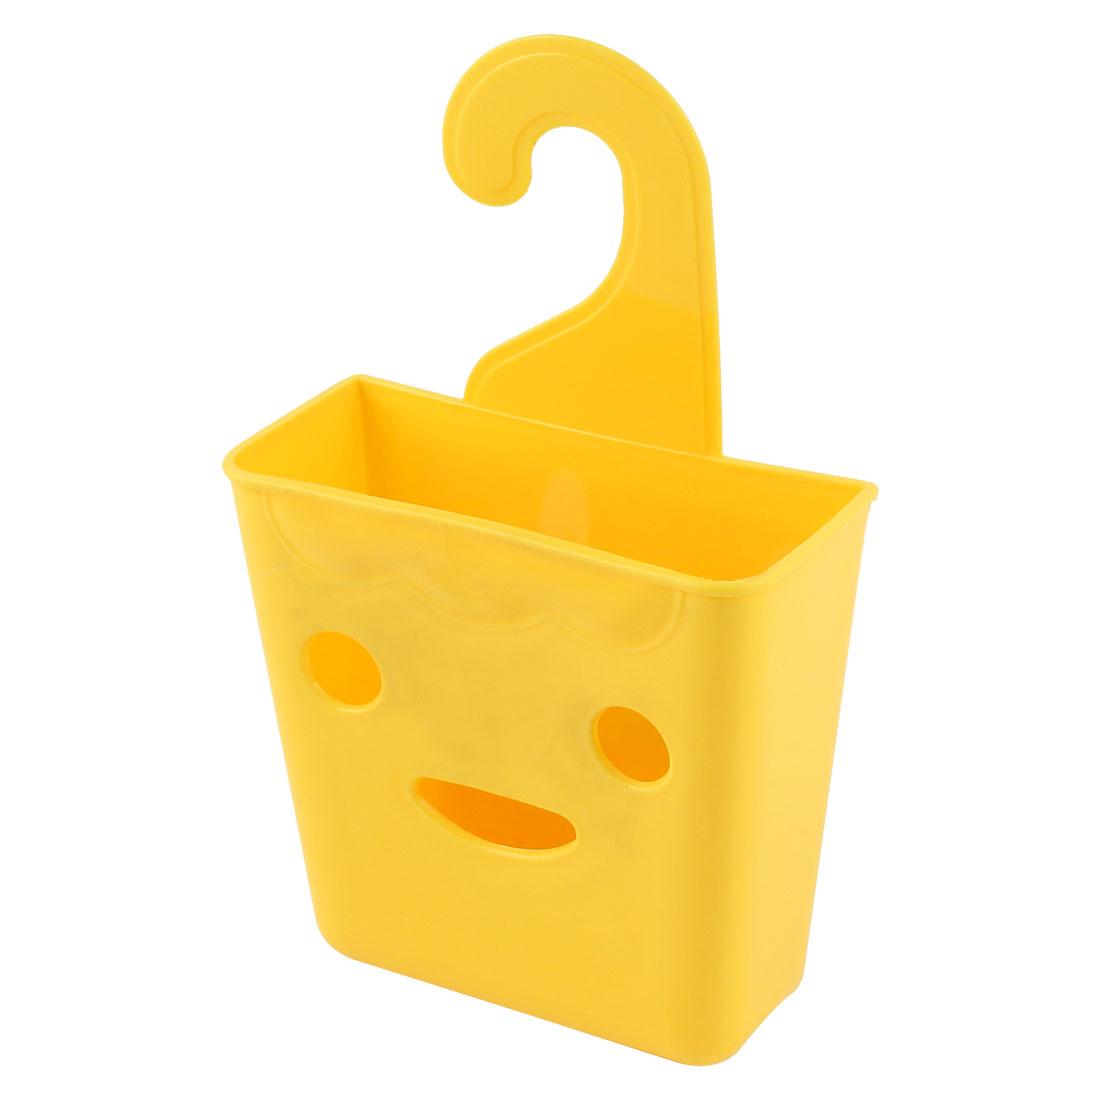 Bathroom Closet Plastic Smiling Face Design Wall Hanging Storage Case Basket Organizer Holder Yellow